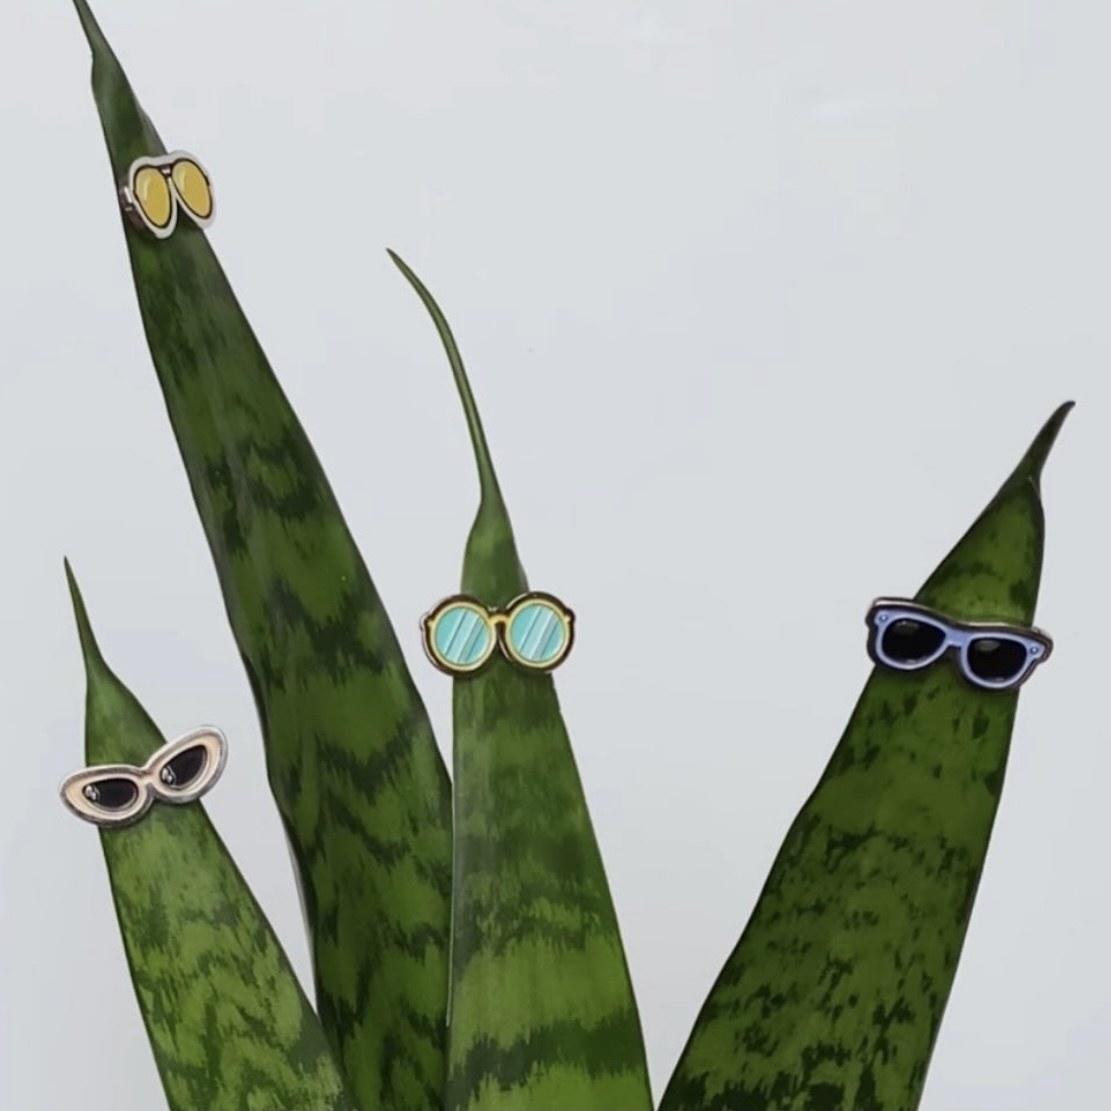 Eyeglasses plant magnet